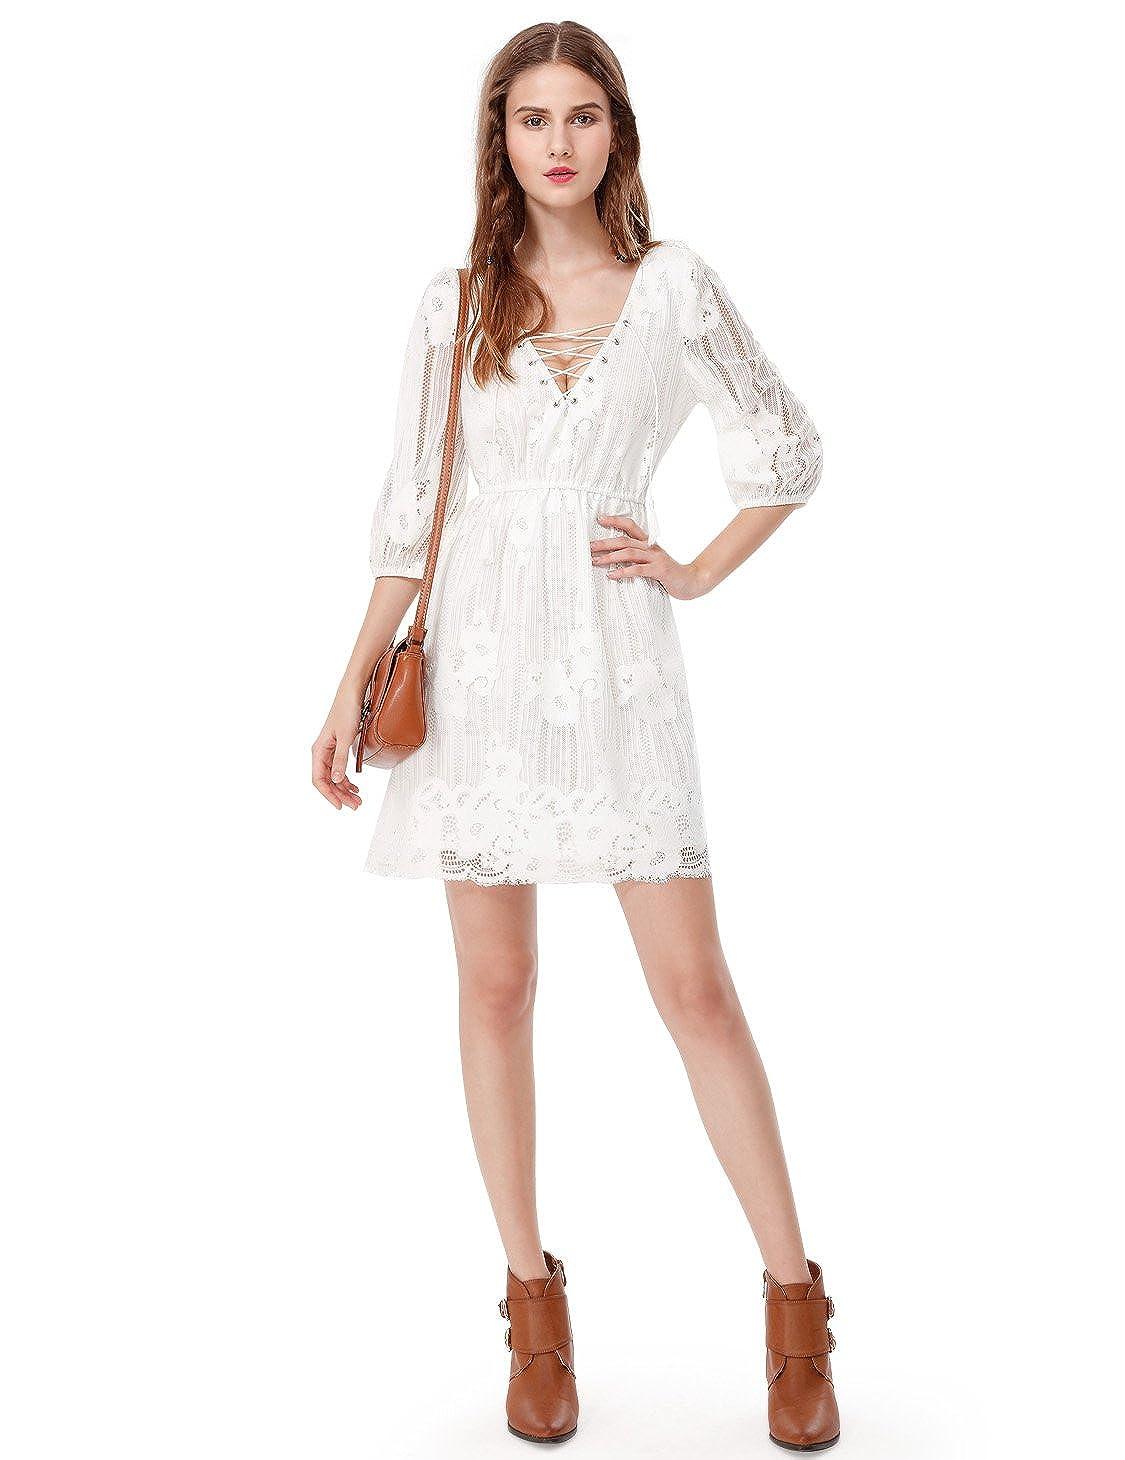 f617508047e6 Women's V-Neck Boho Lace Little White Dress 05613 at Amazon Women's Clothing  store: